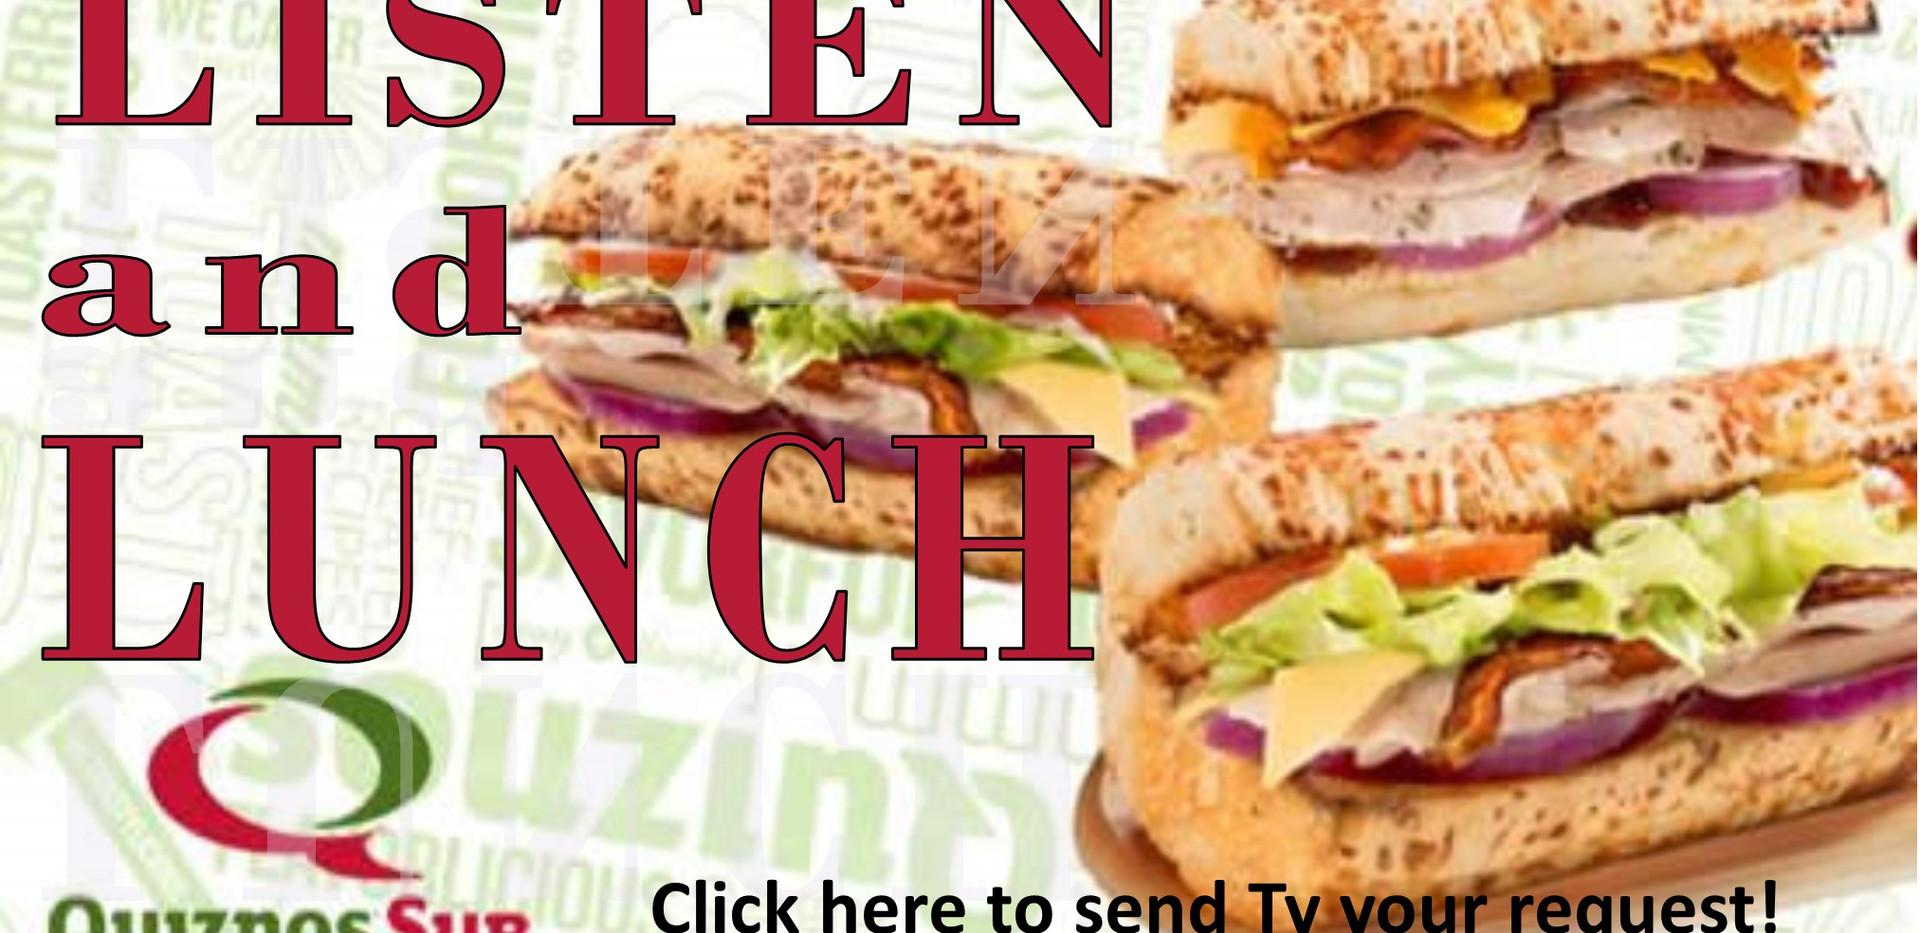 Quiznos Listen and Lunch.jpg